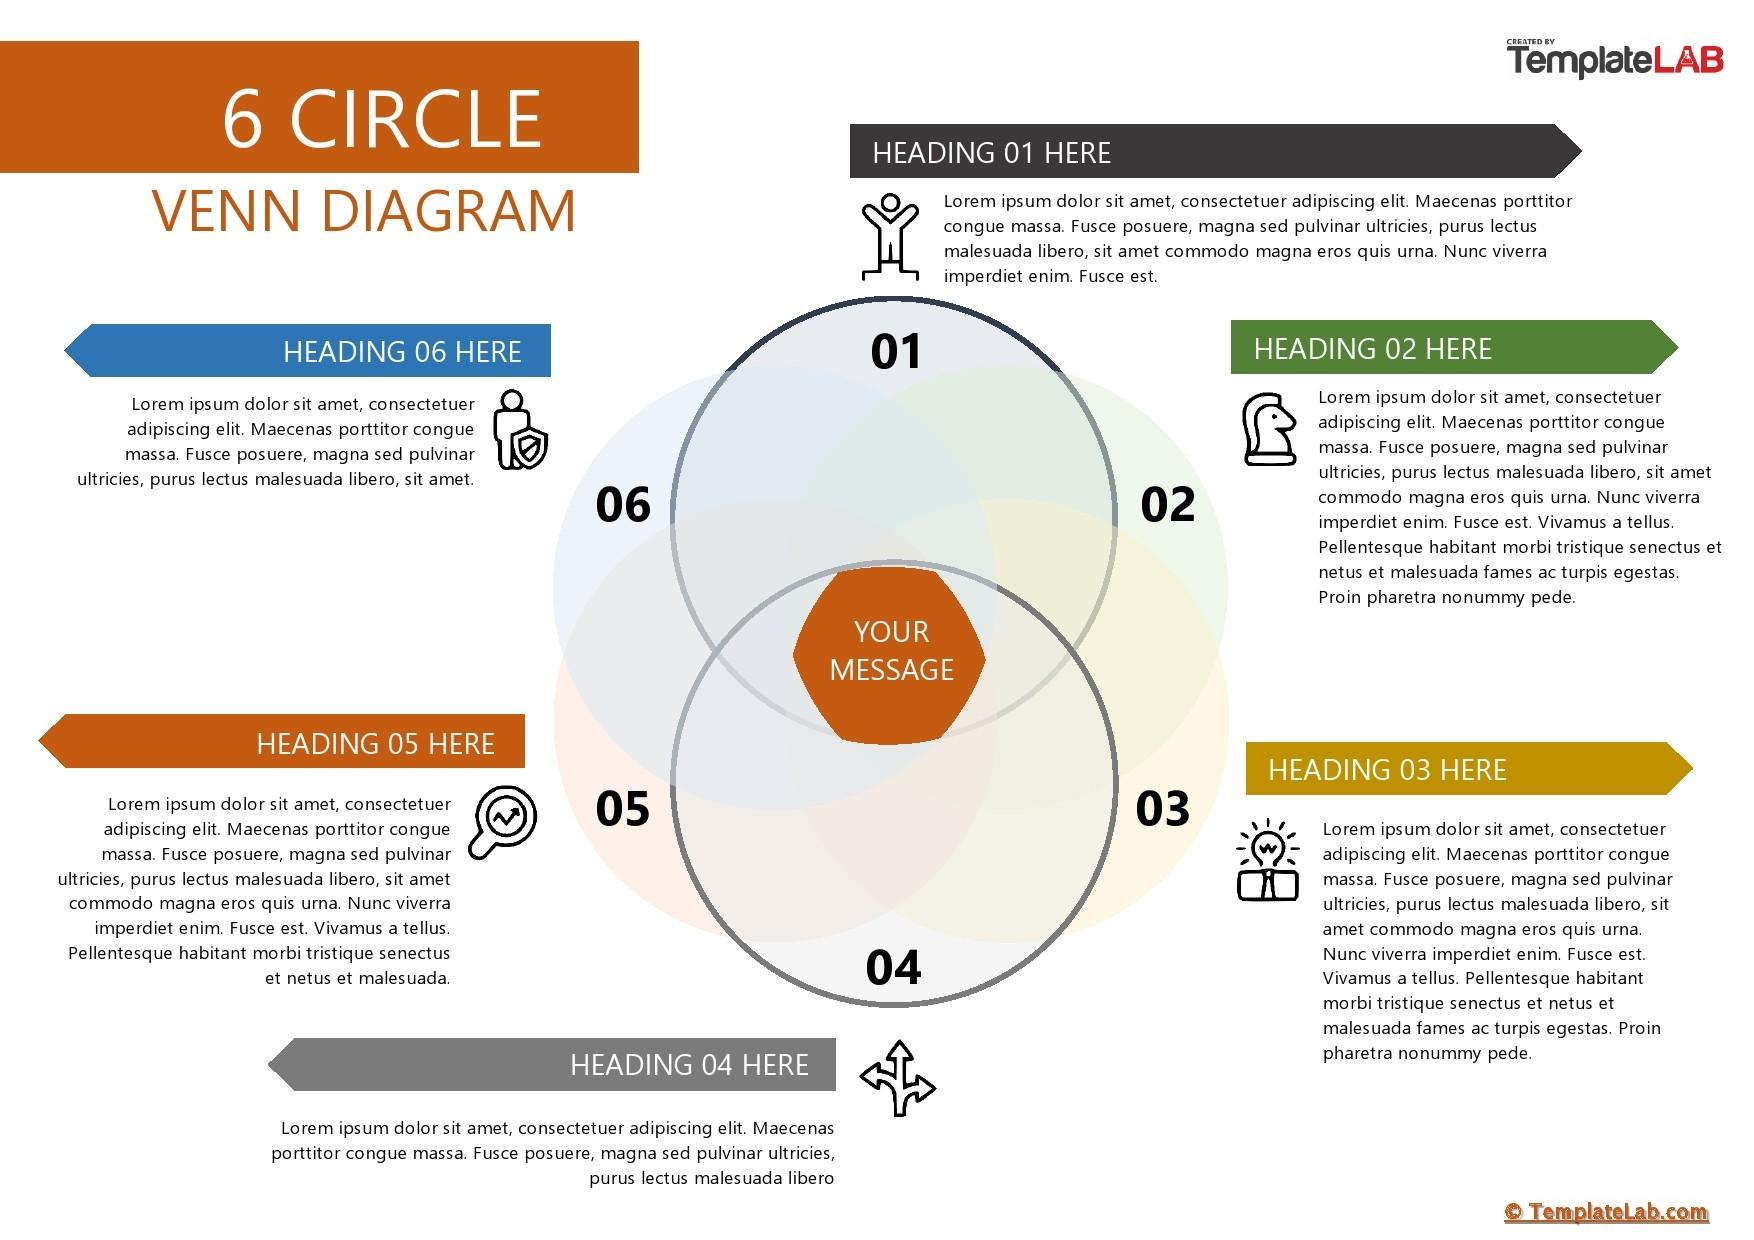 Free 6 Circle Venn Diagram Template - TemplateLab.com